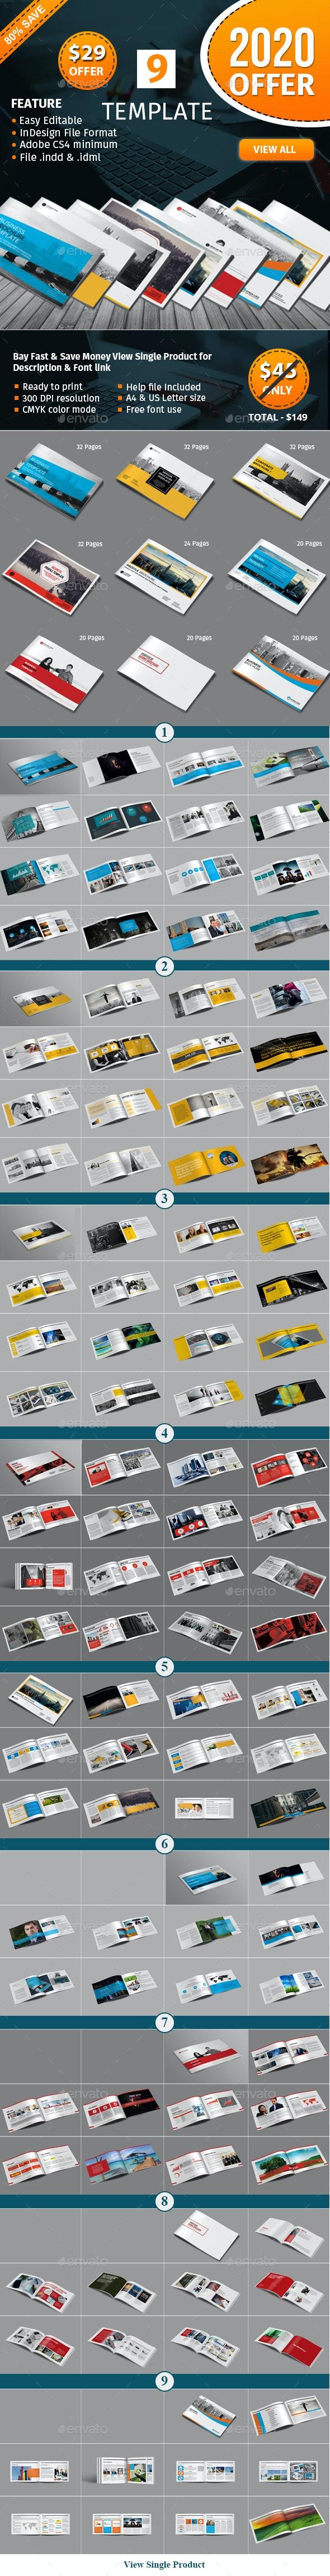 Lanscape Brochure Template Bundle - Corporate Brochures